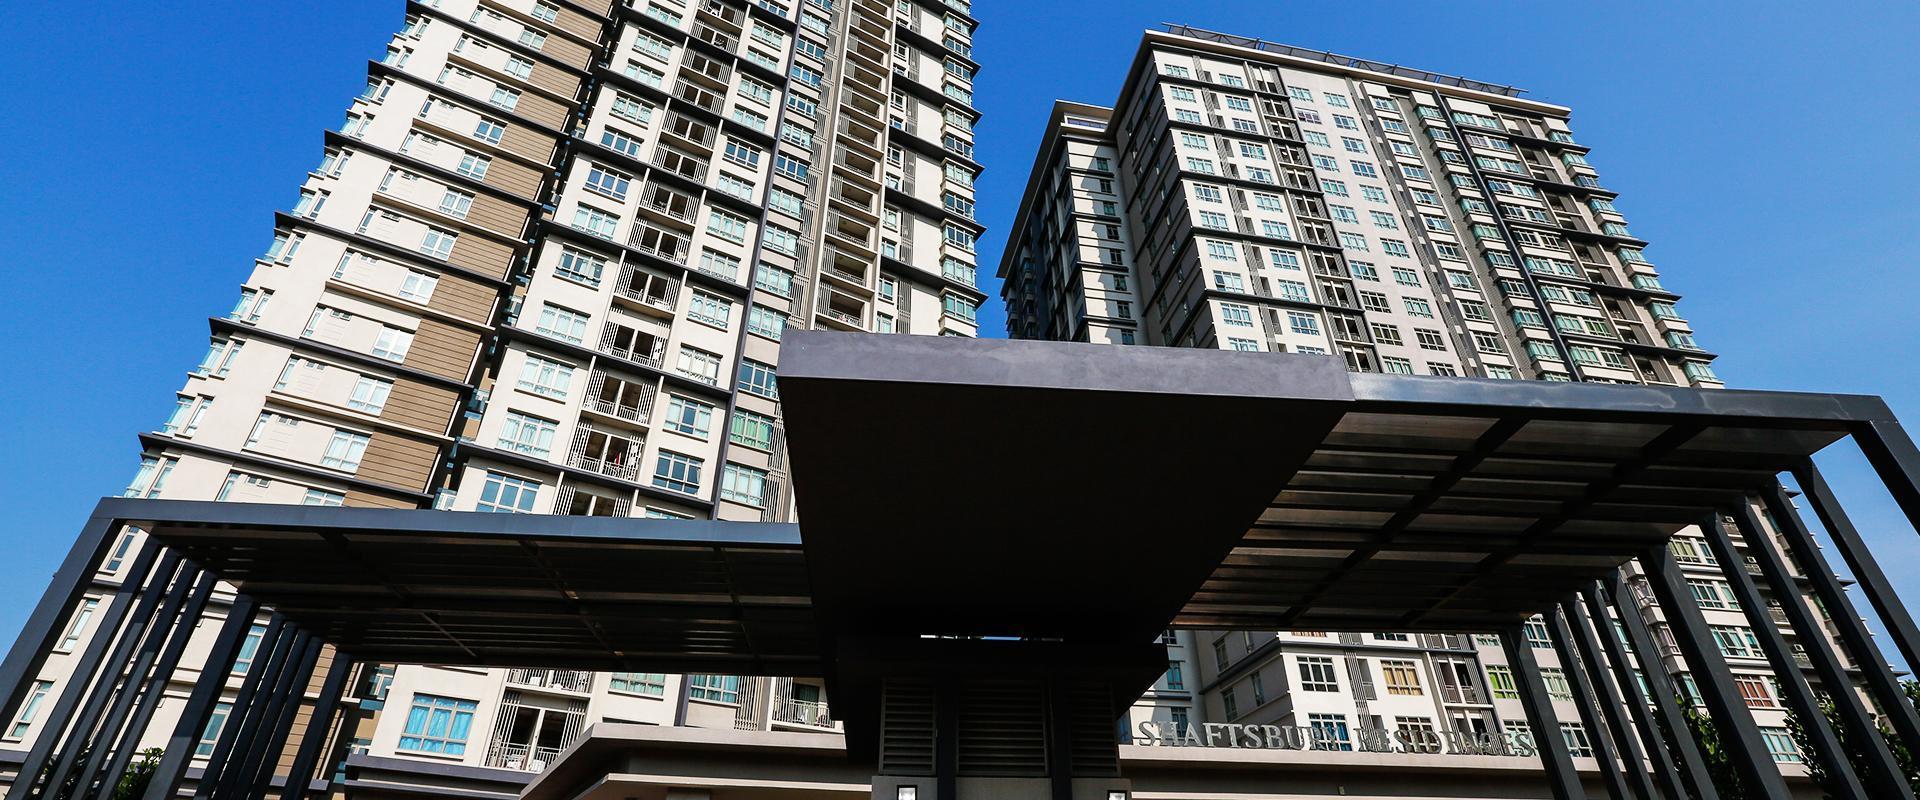 Shaftsbury Residences @ Cyberjaya by Idealhub, Kuala Lumpur